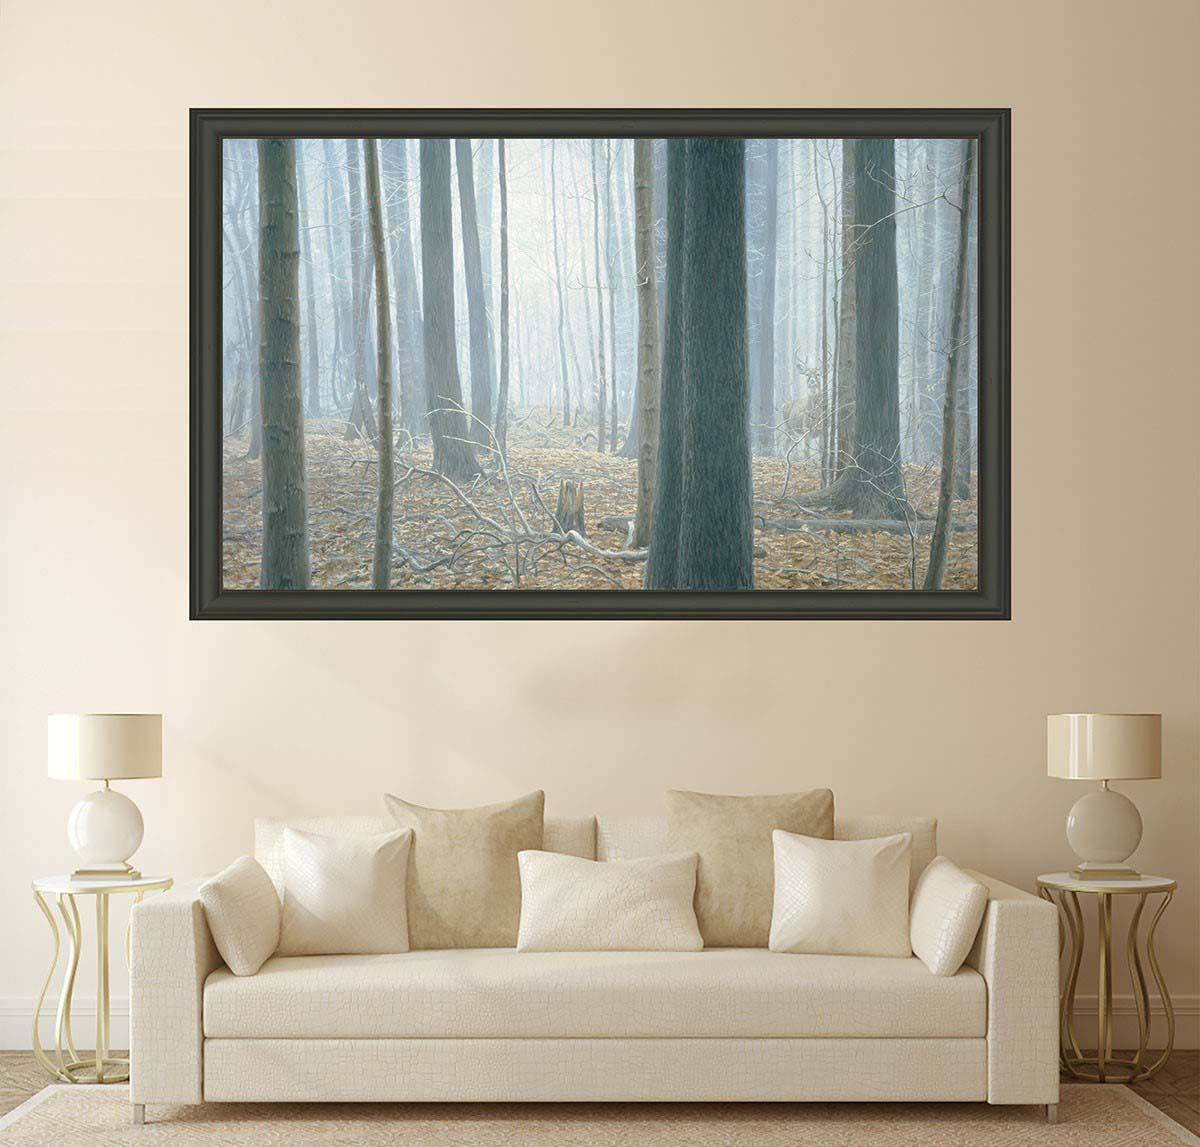 Hardwood Forest - White-Tailed Deer - Museum Edition - Robert Bateman